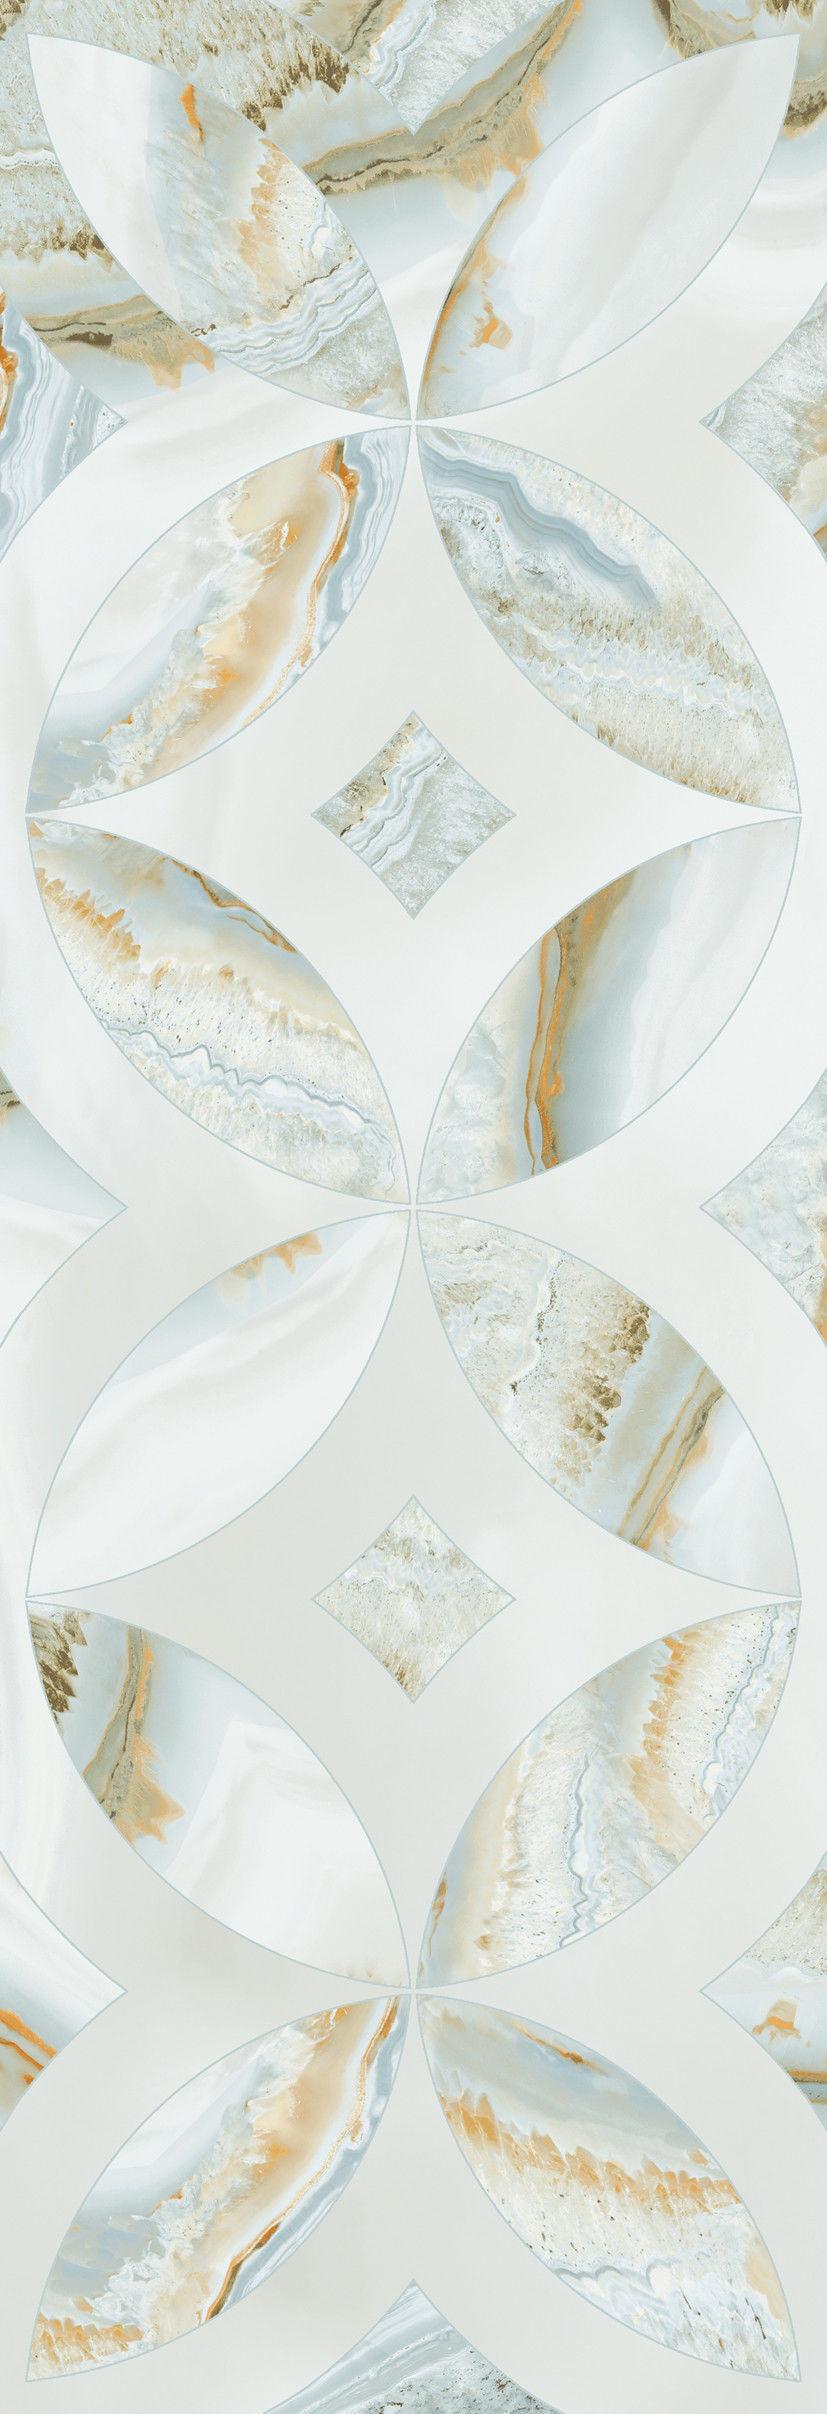 Beyond Turquesa Decor 29,75x89,46 płytki dekoracyjne